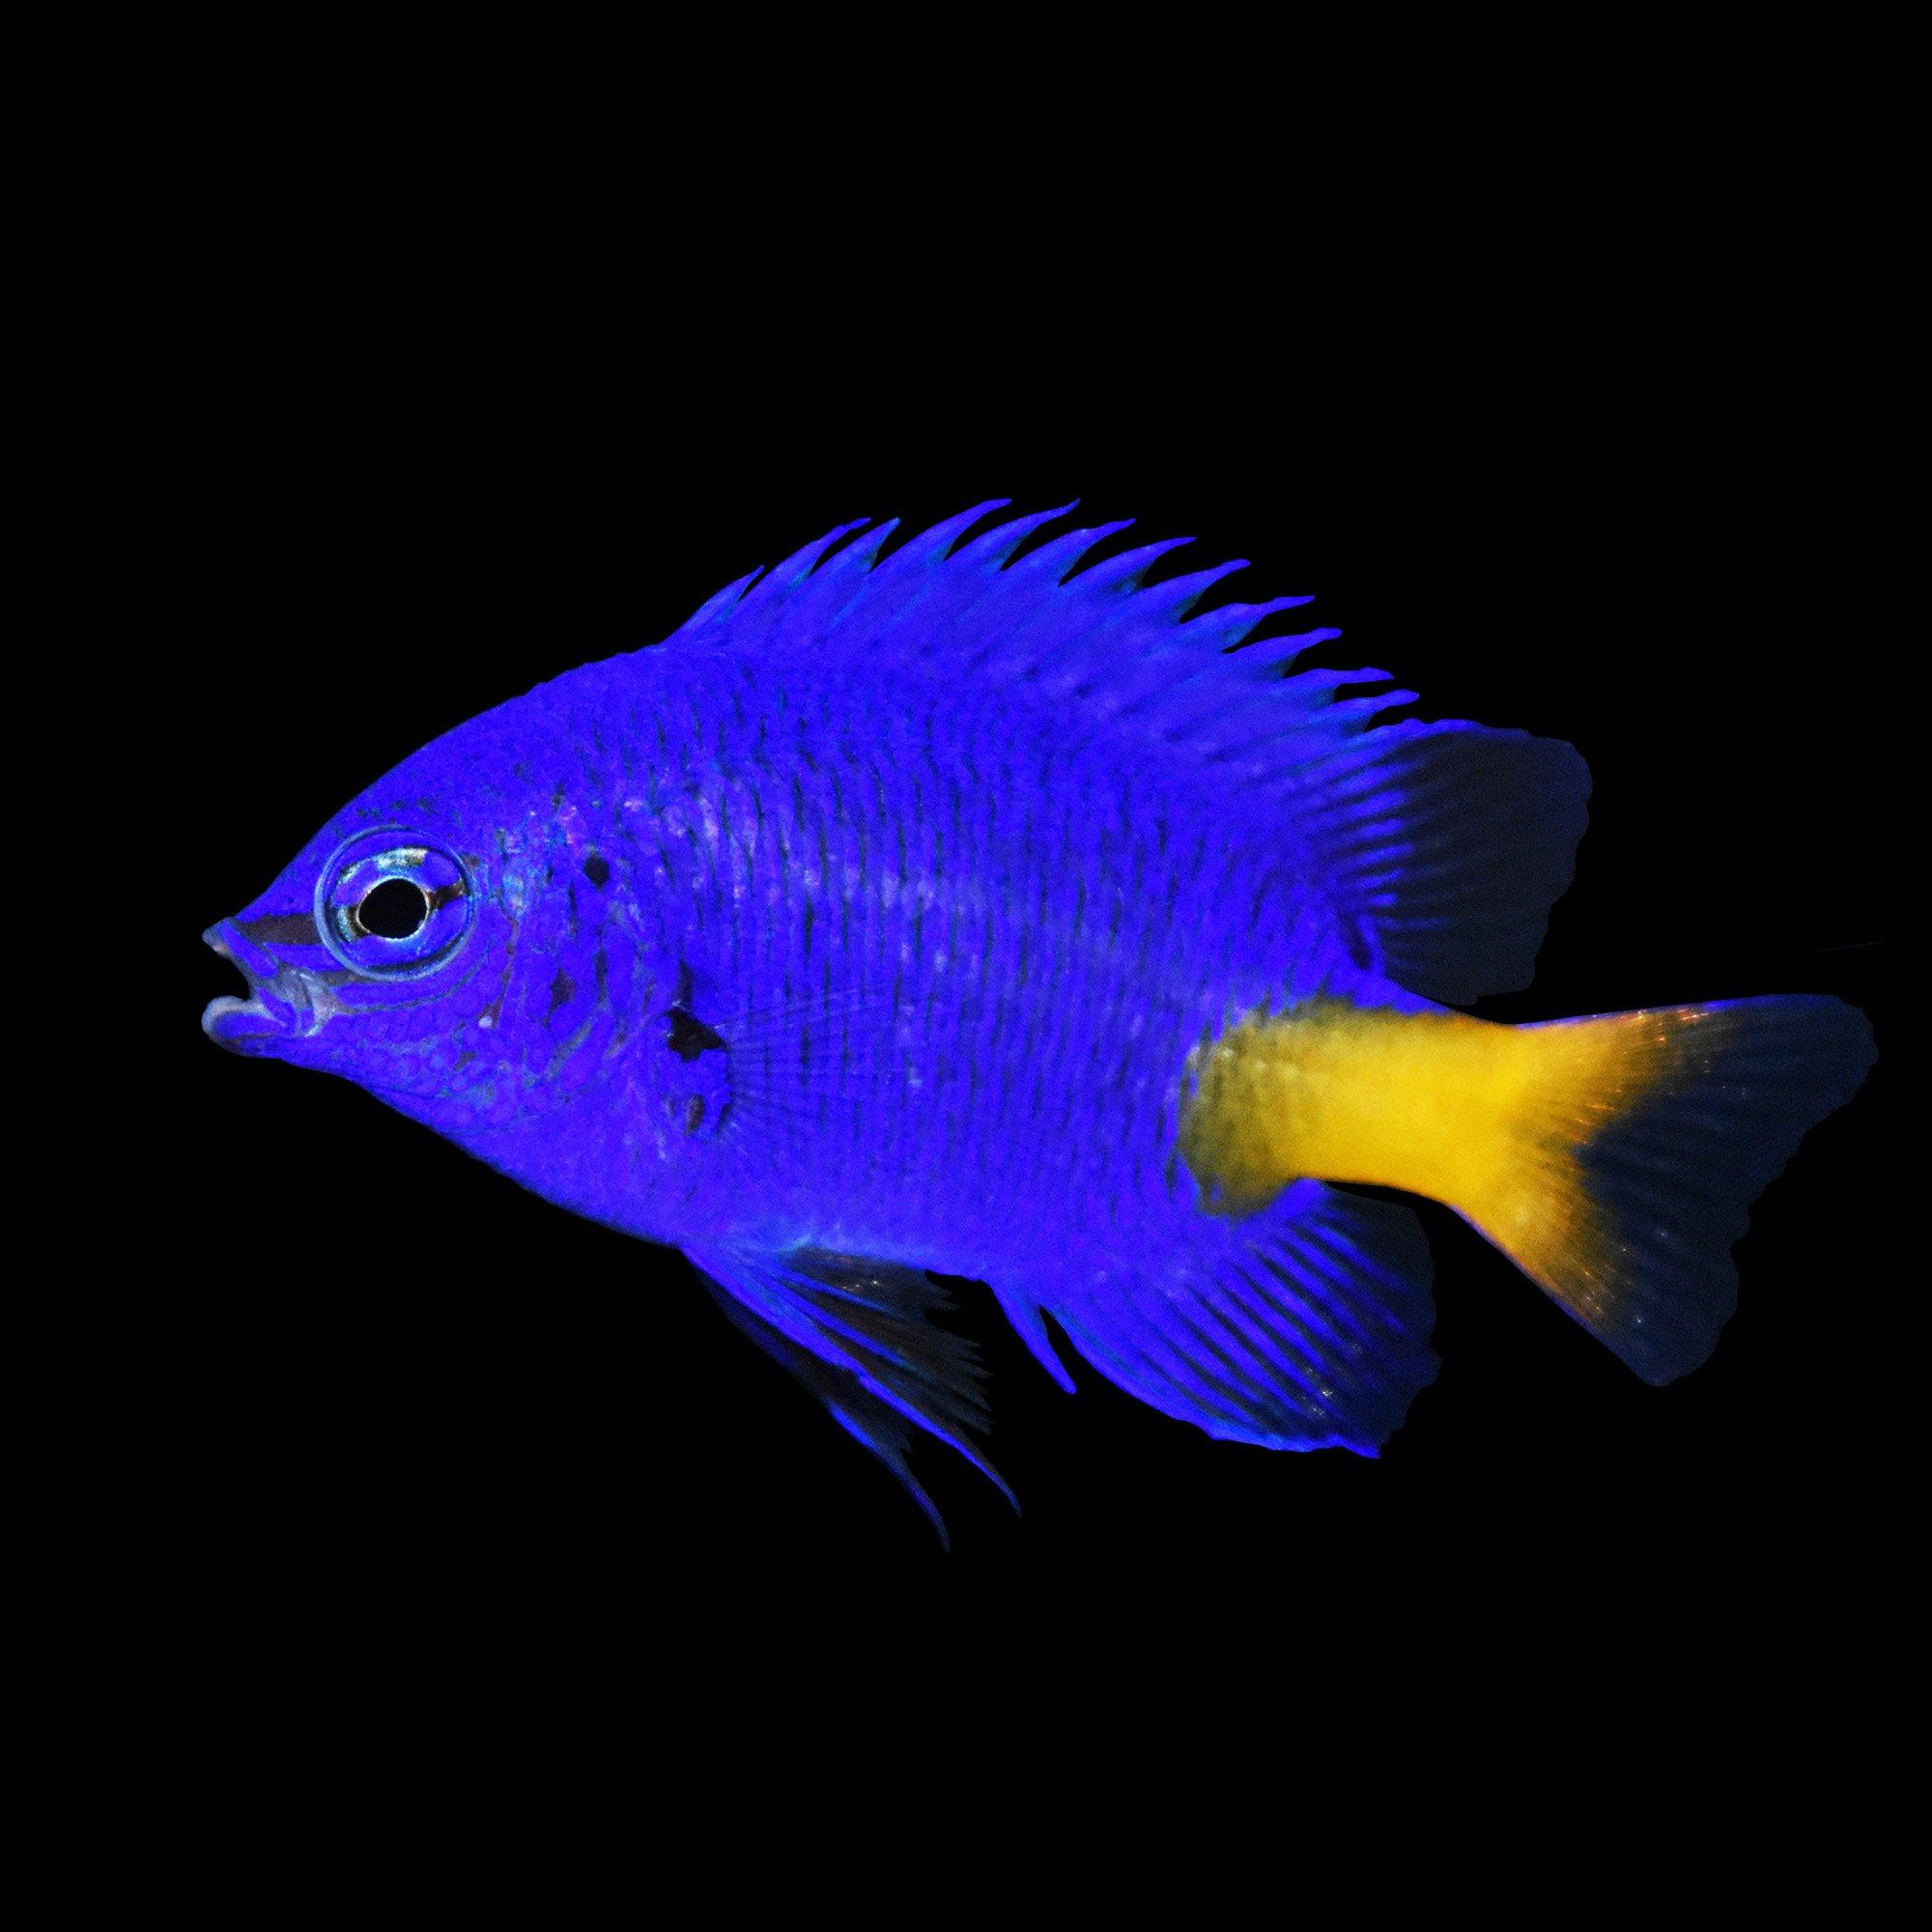 Fish for saltwater aquarium - Yellowtail Blue Damsel